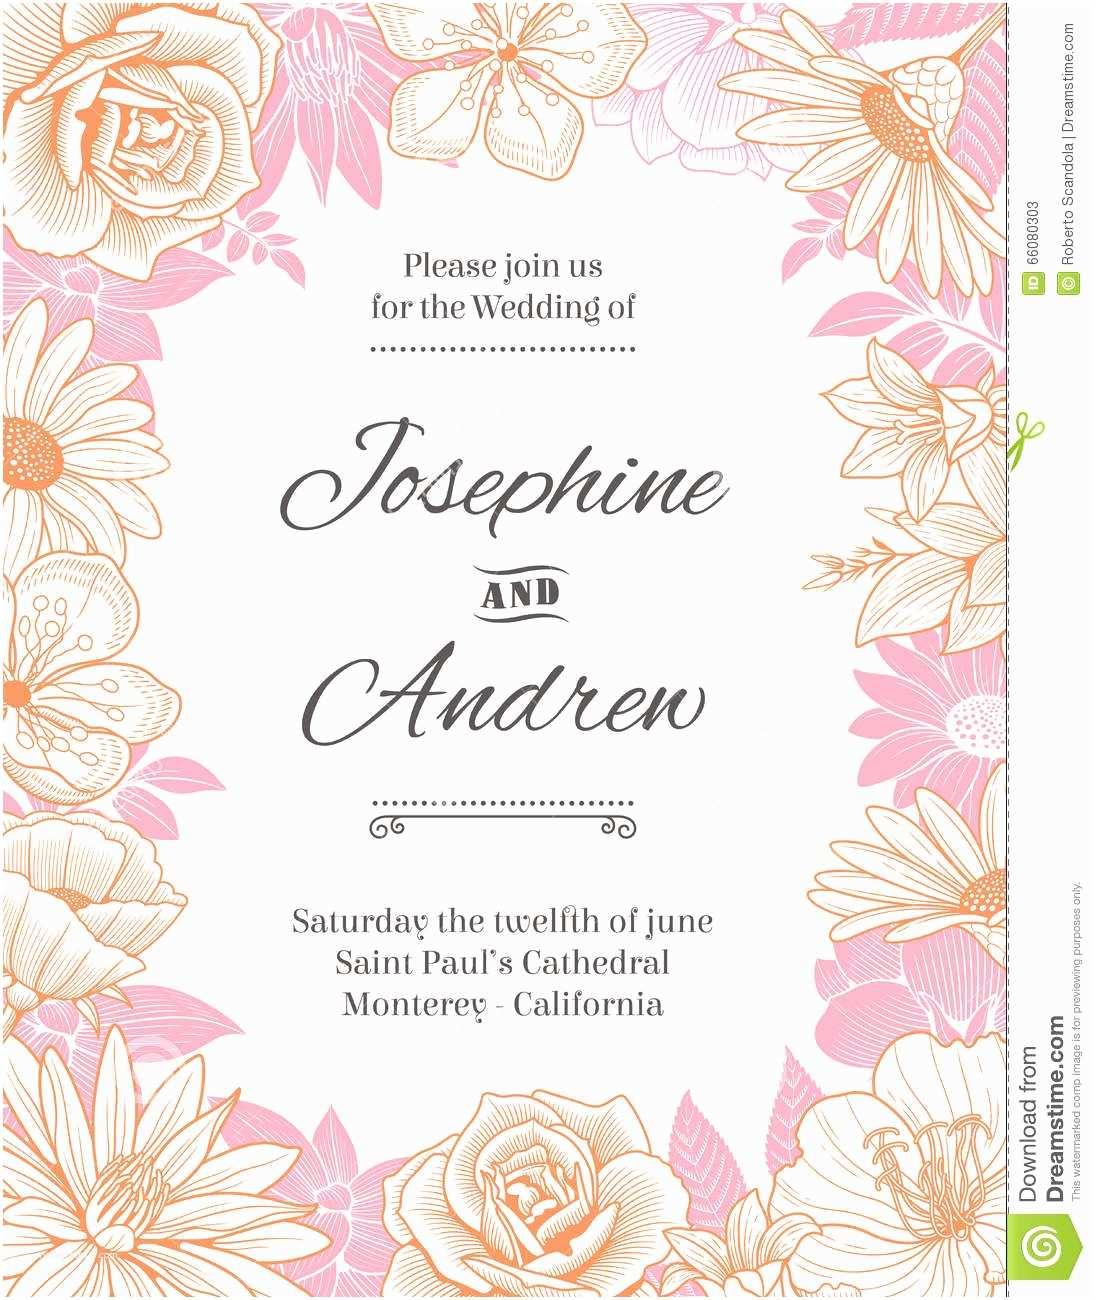 Vector Flowers for Wedding Invitations Vector Flower Frame Wedding Invite Stock Vector